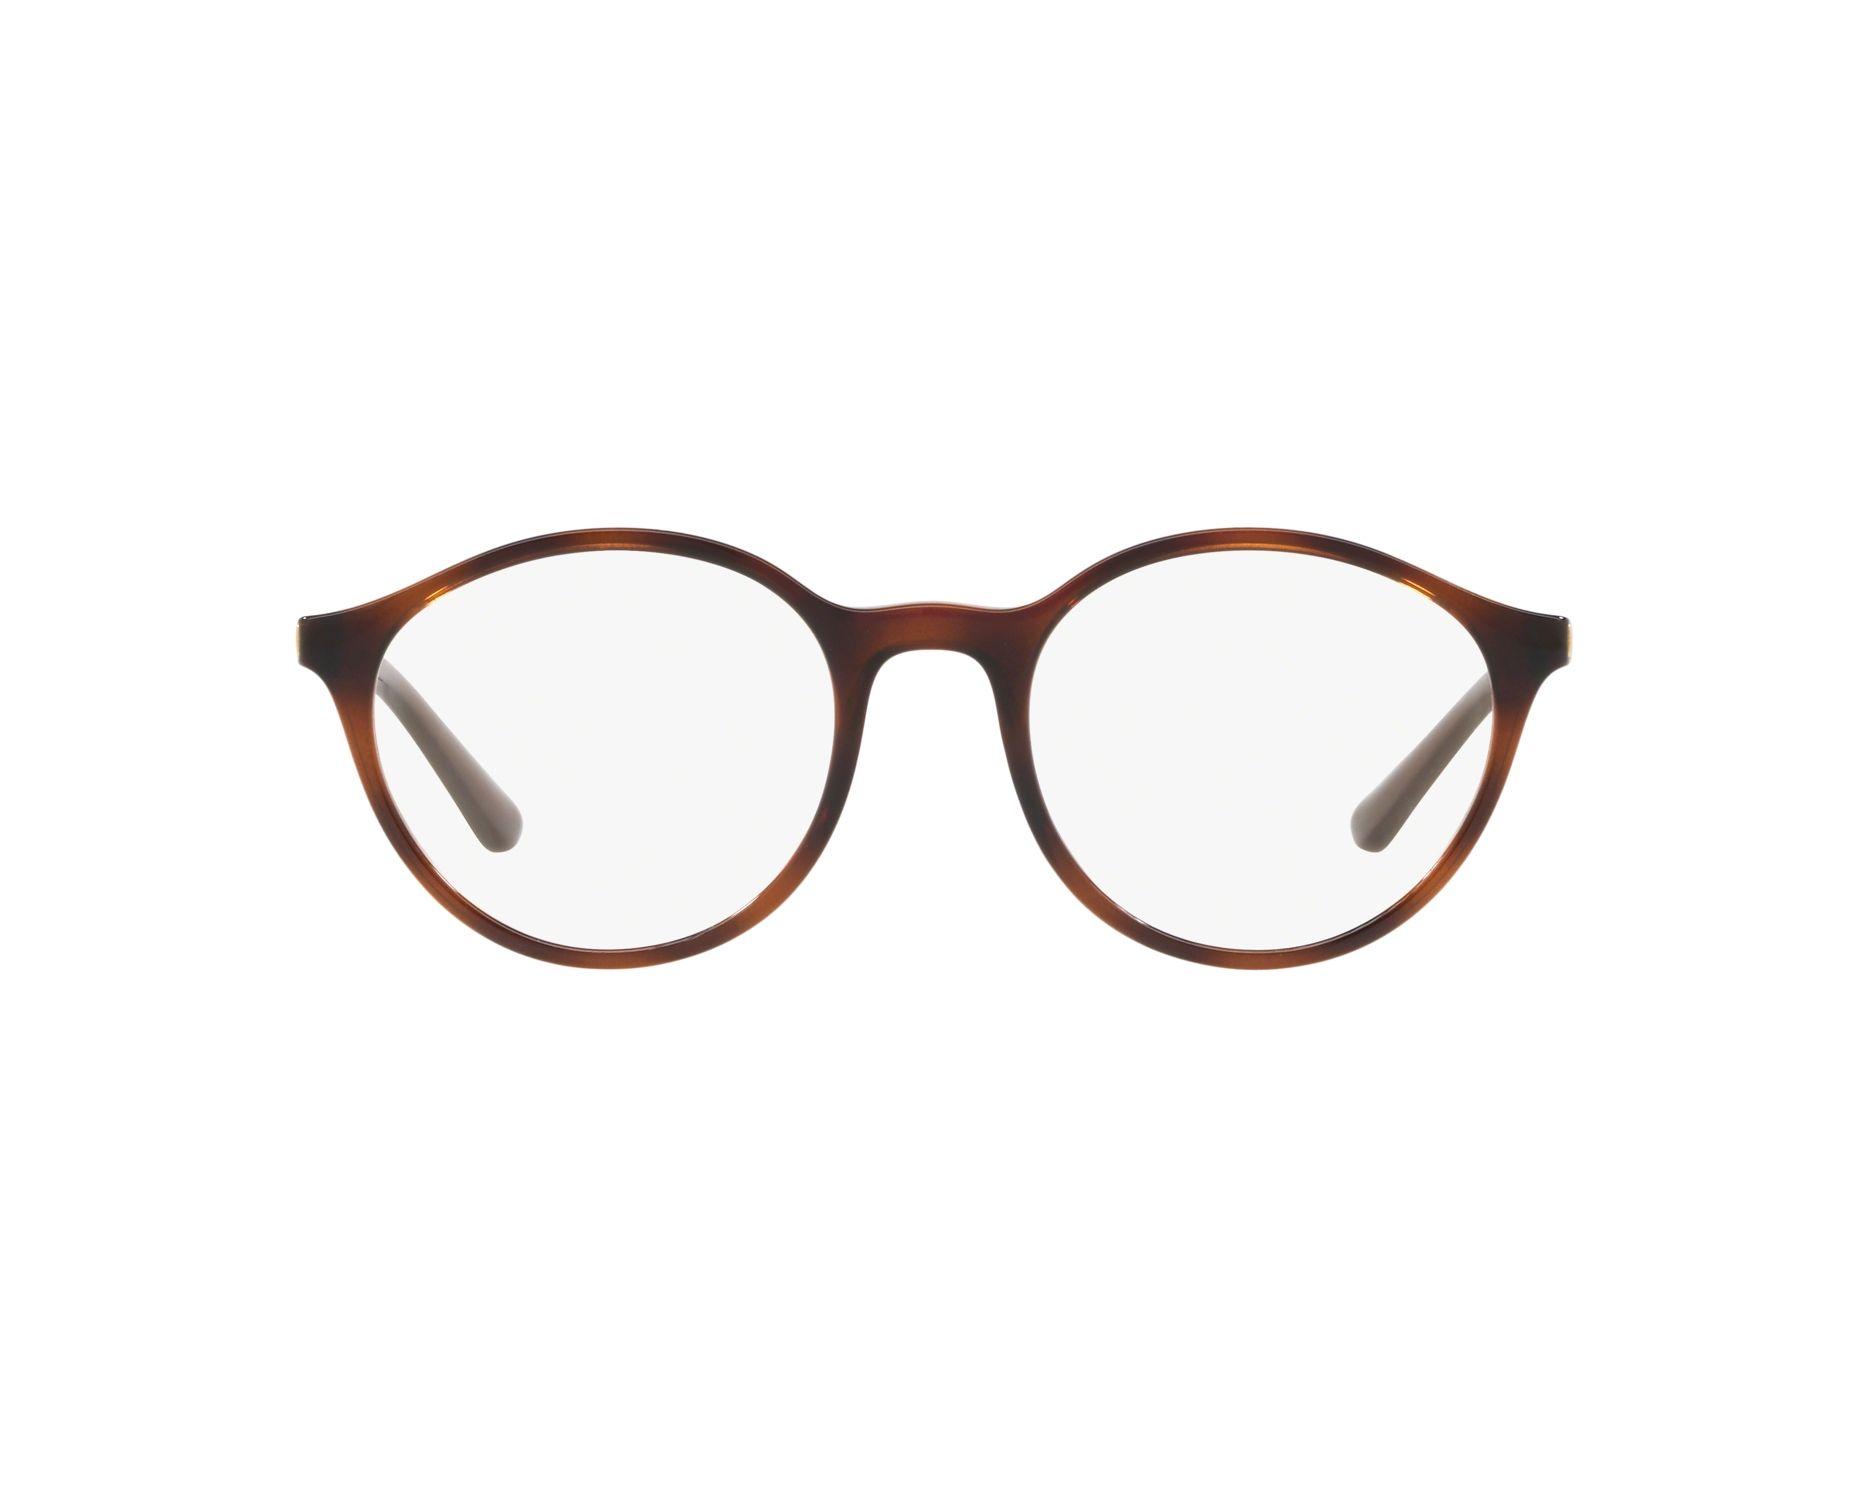 f5887f30669 eyeglasses Vogue VO-5223 2386 - Havana Gold 360 degree view 1